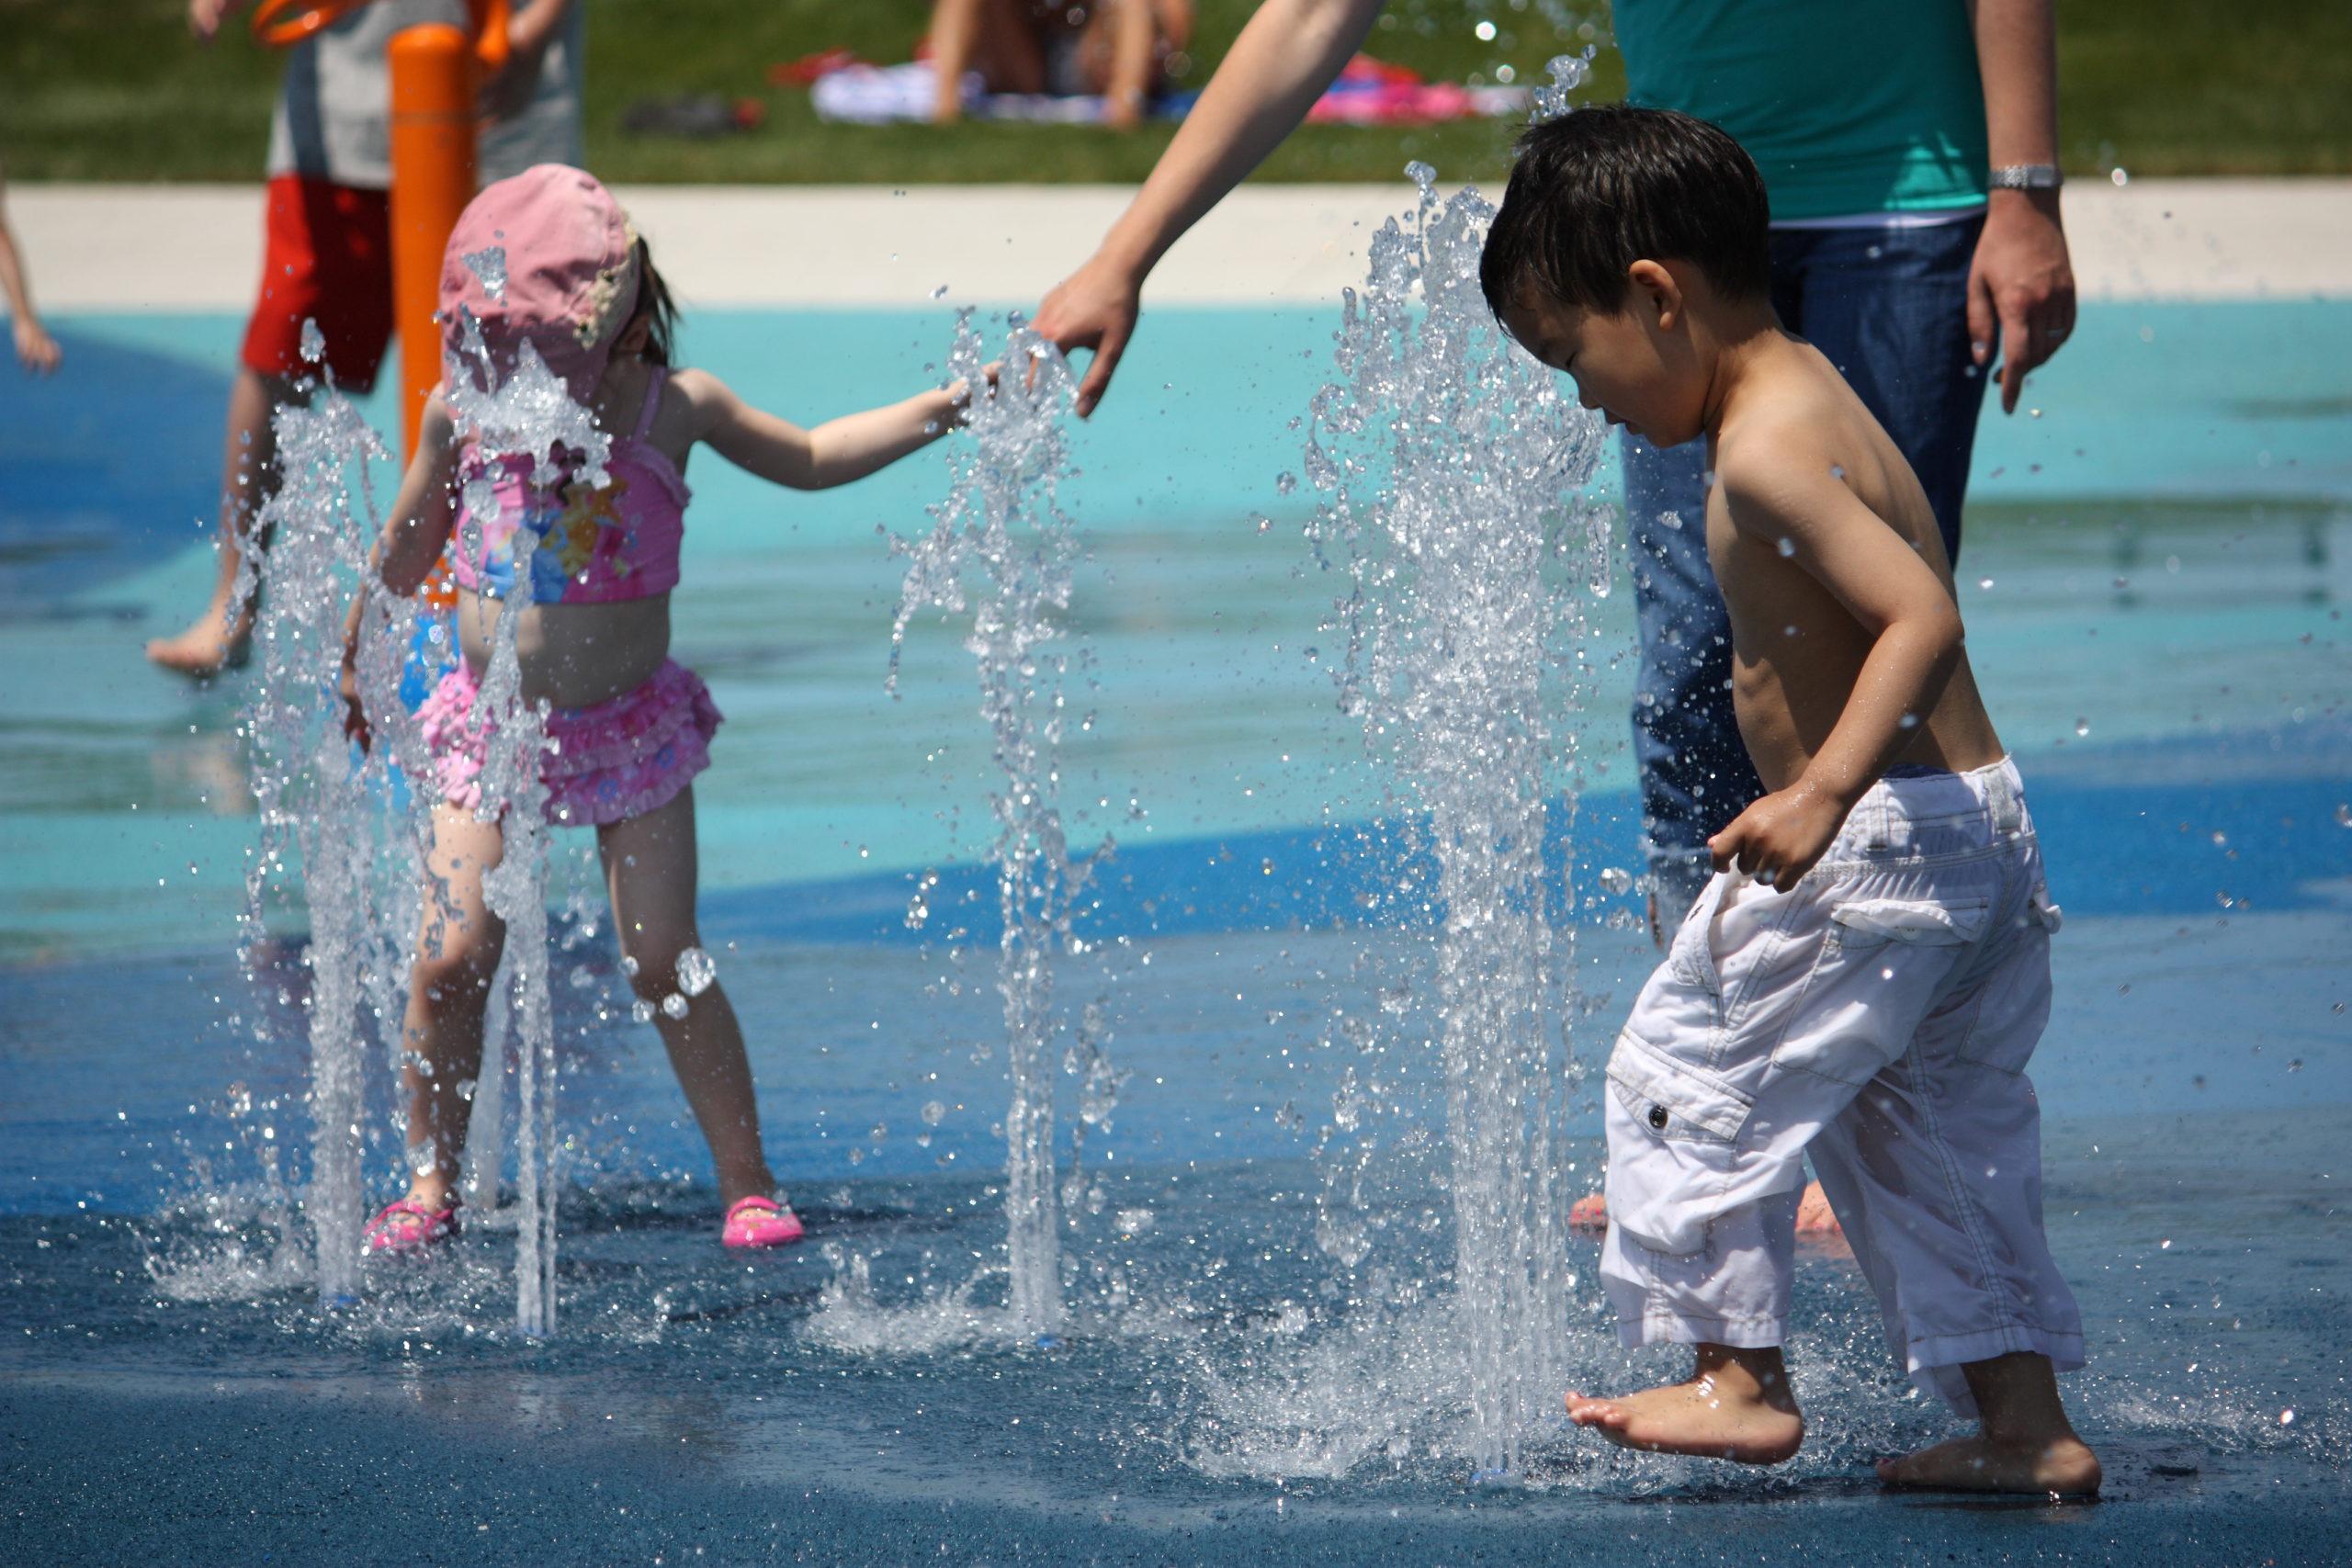 Children playing in a splash pad.